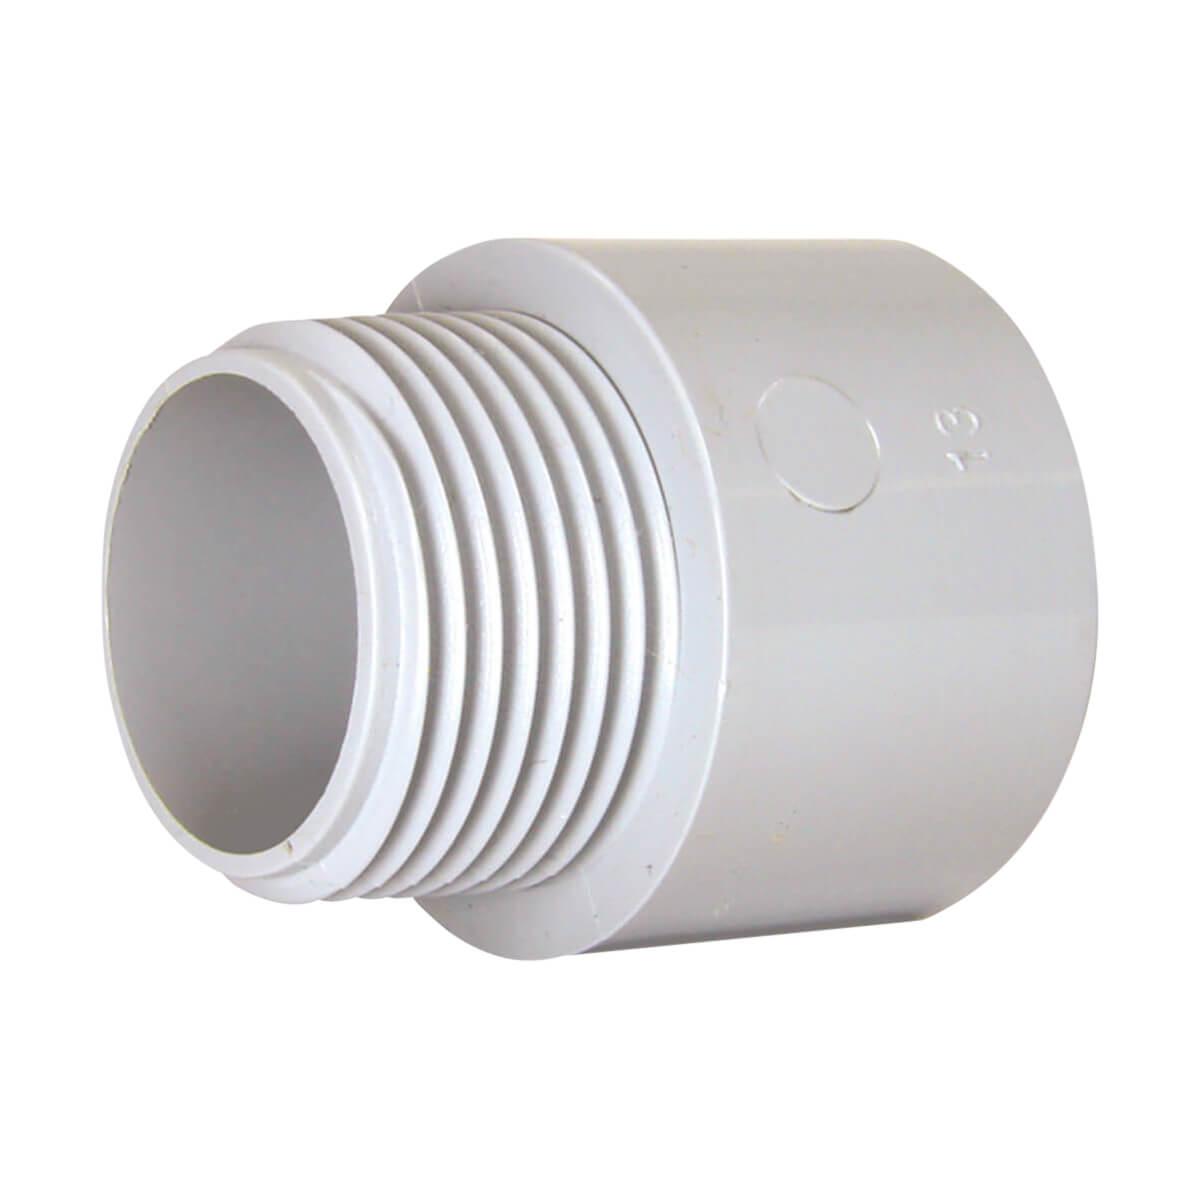 PVC Conduit Terminal Adapter - Hub x MPT (M) - 1-in